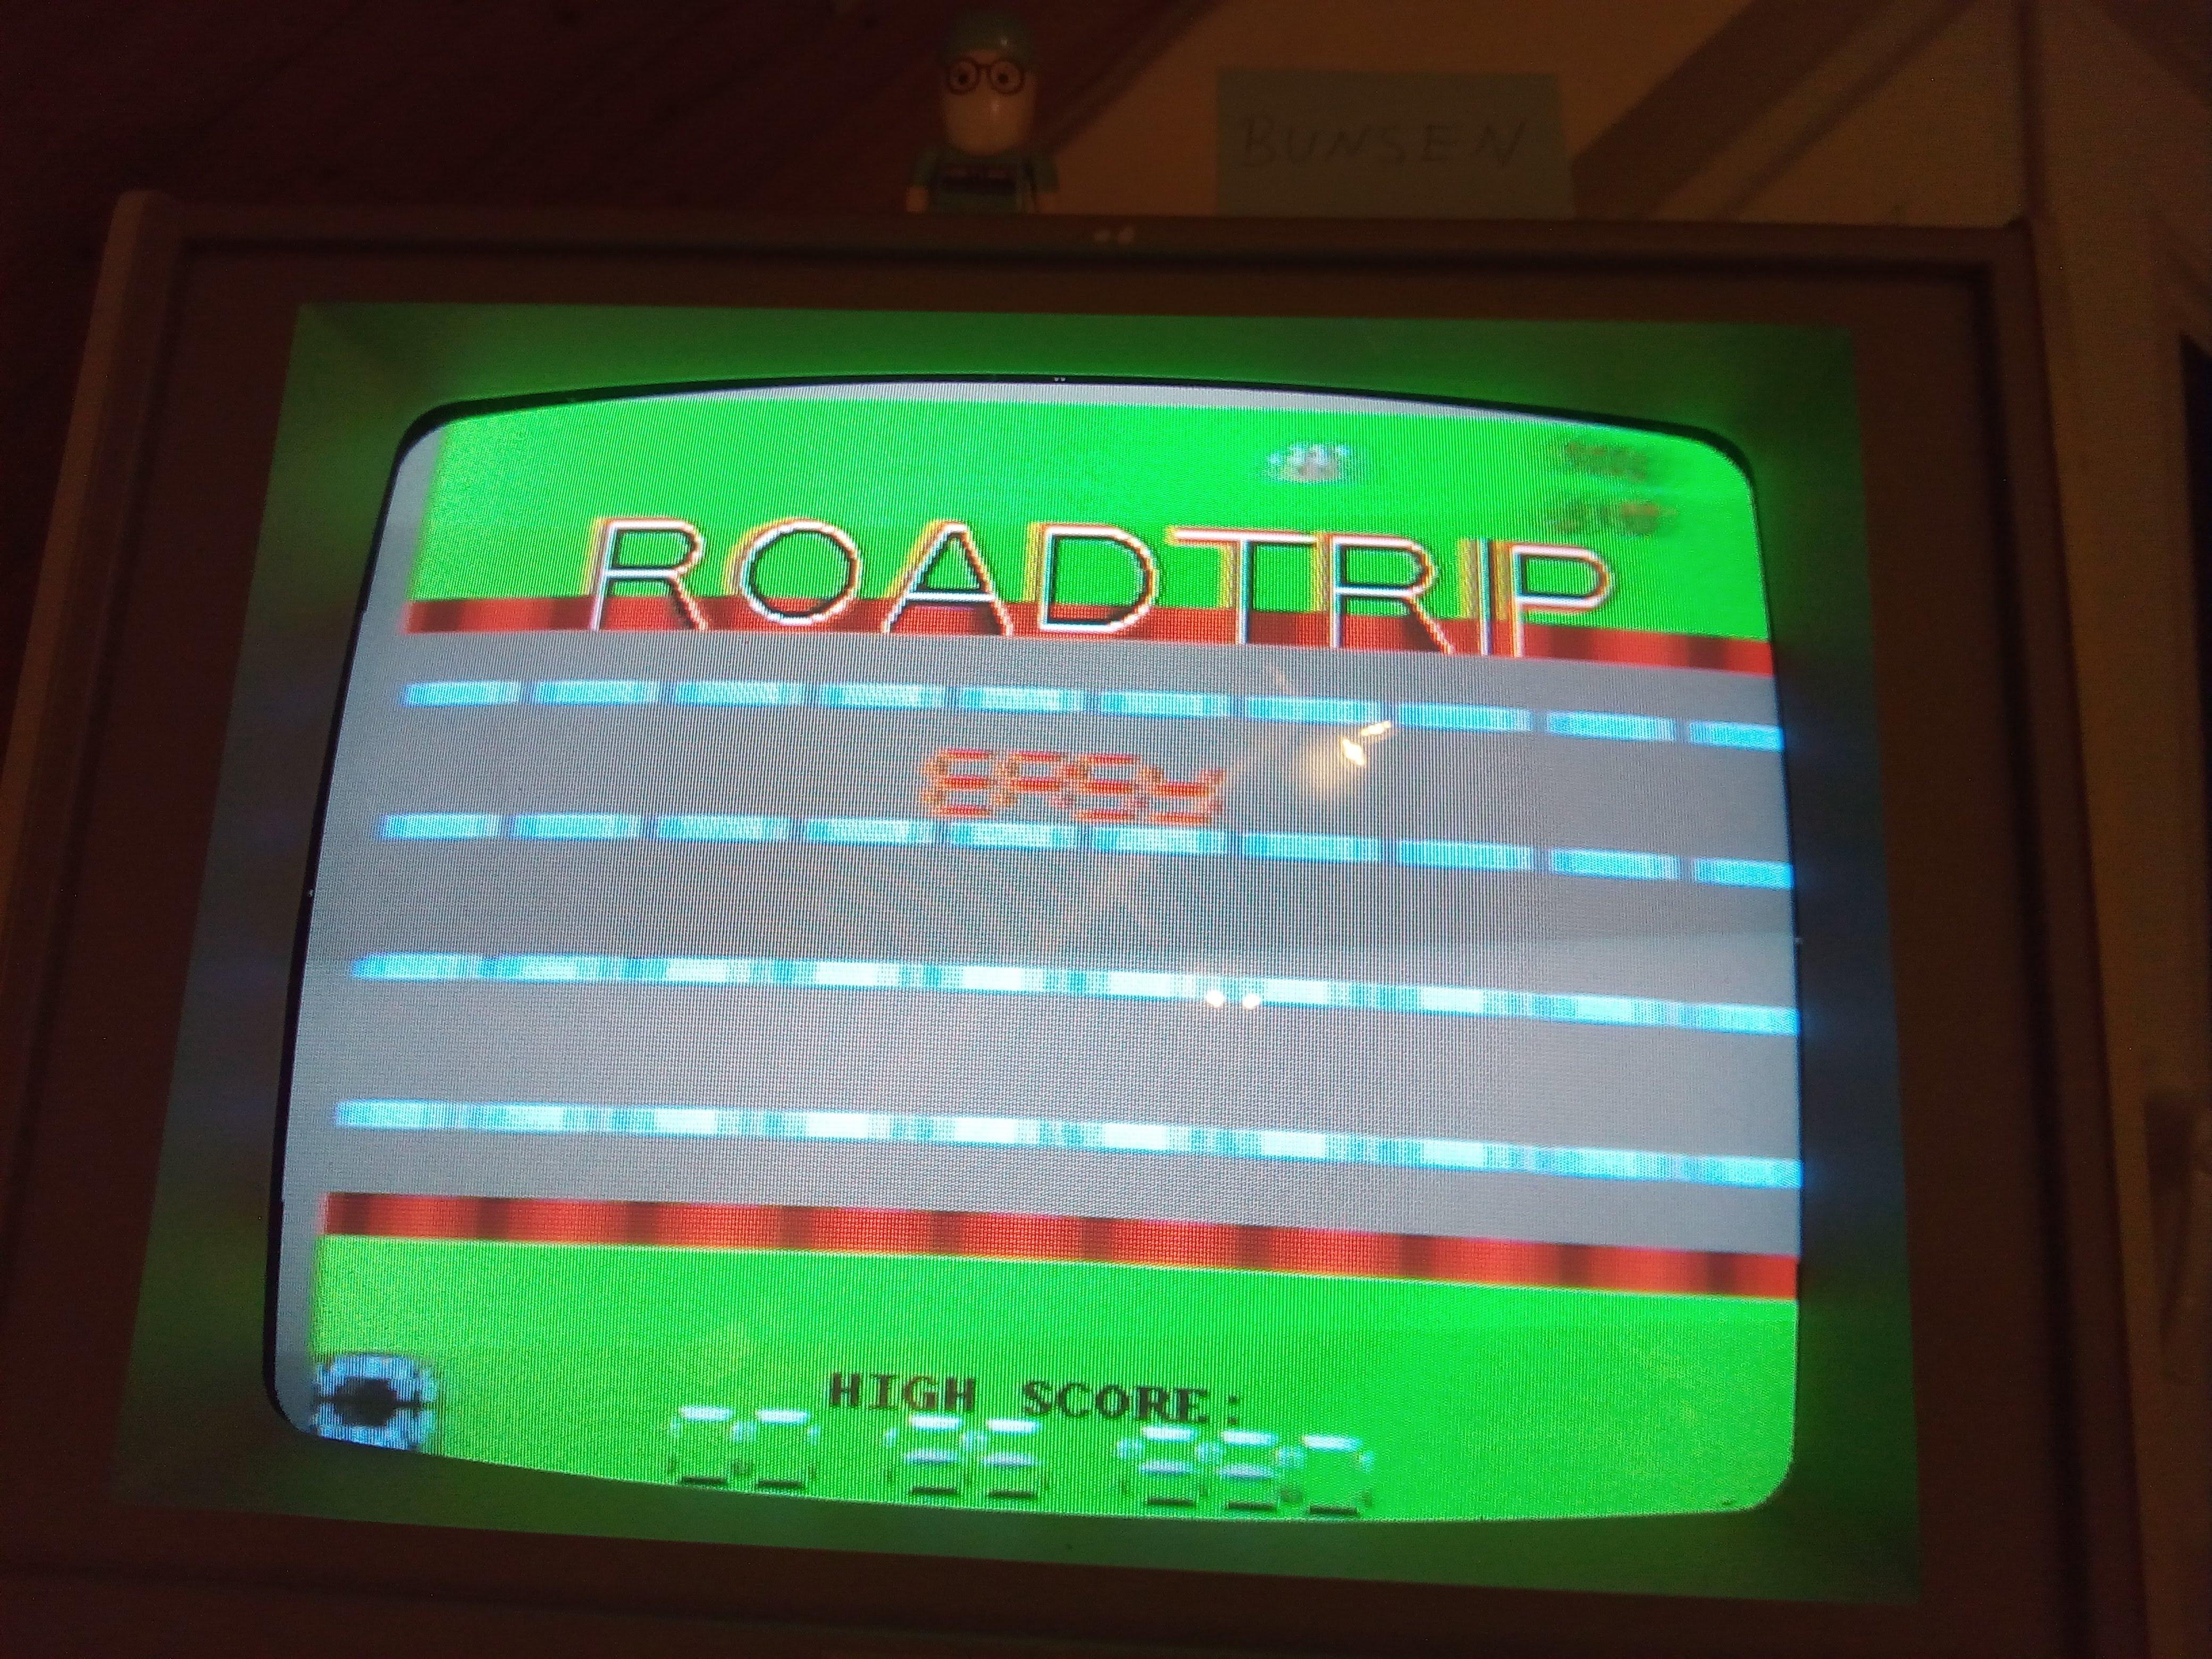 Bunsen: Roadtrip [Difficulty: Easy] (Amiga) 1,351,990 points on 2018-11-27 05:09:28